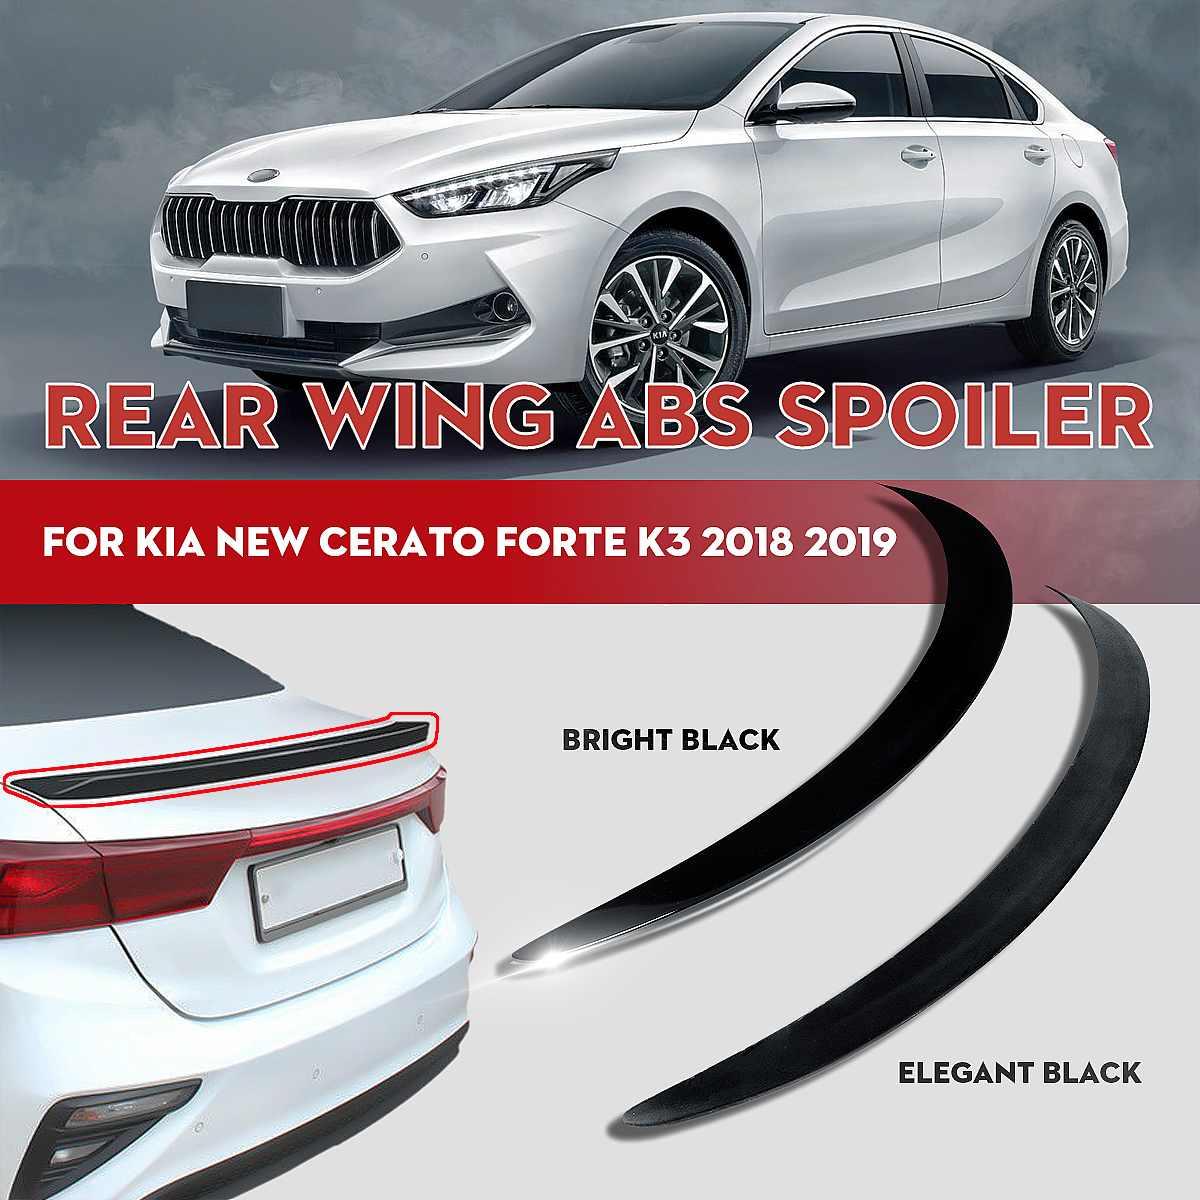 ABS האחורי לרכב תא מטען ספוילר שפתיים אגף משמר מט בהיר שחור עבור Kia Cerato פורטה ספורט GT 2018 2019